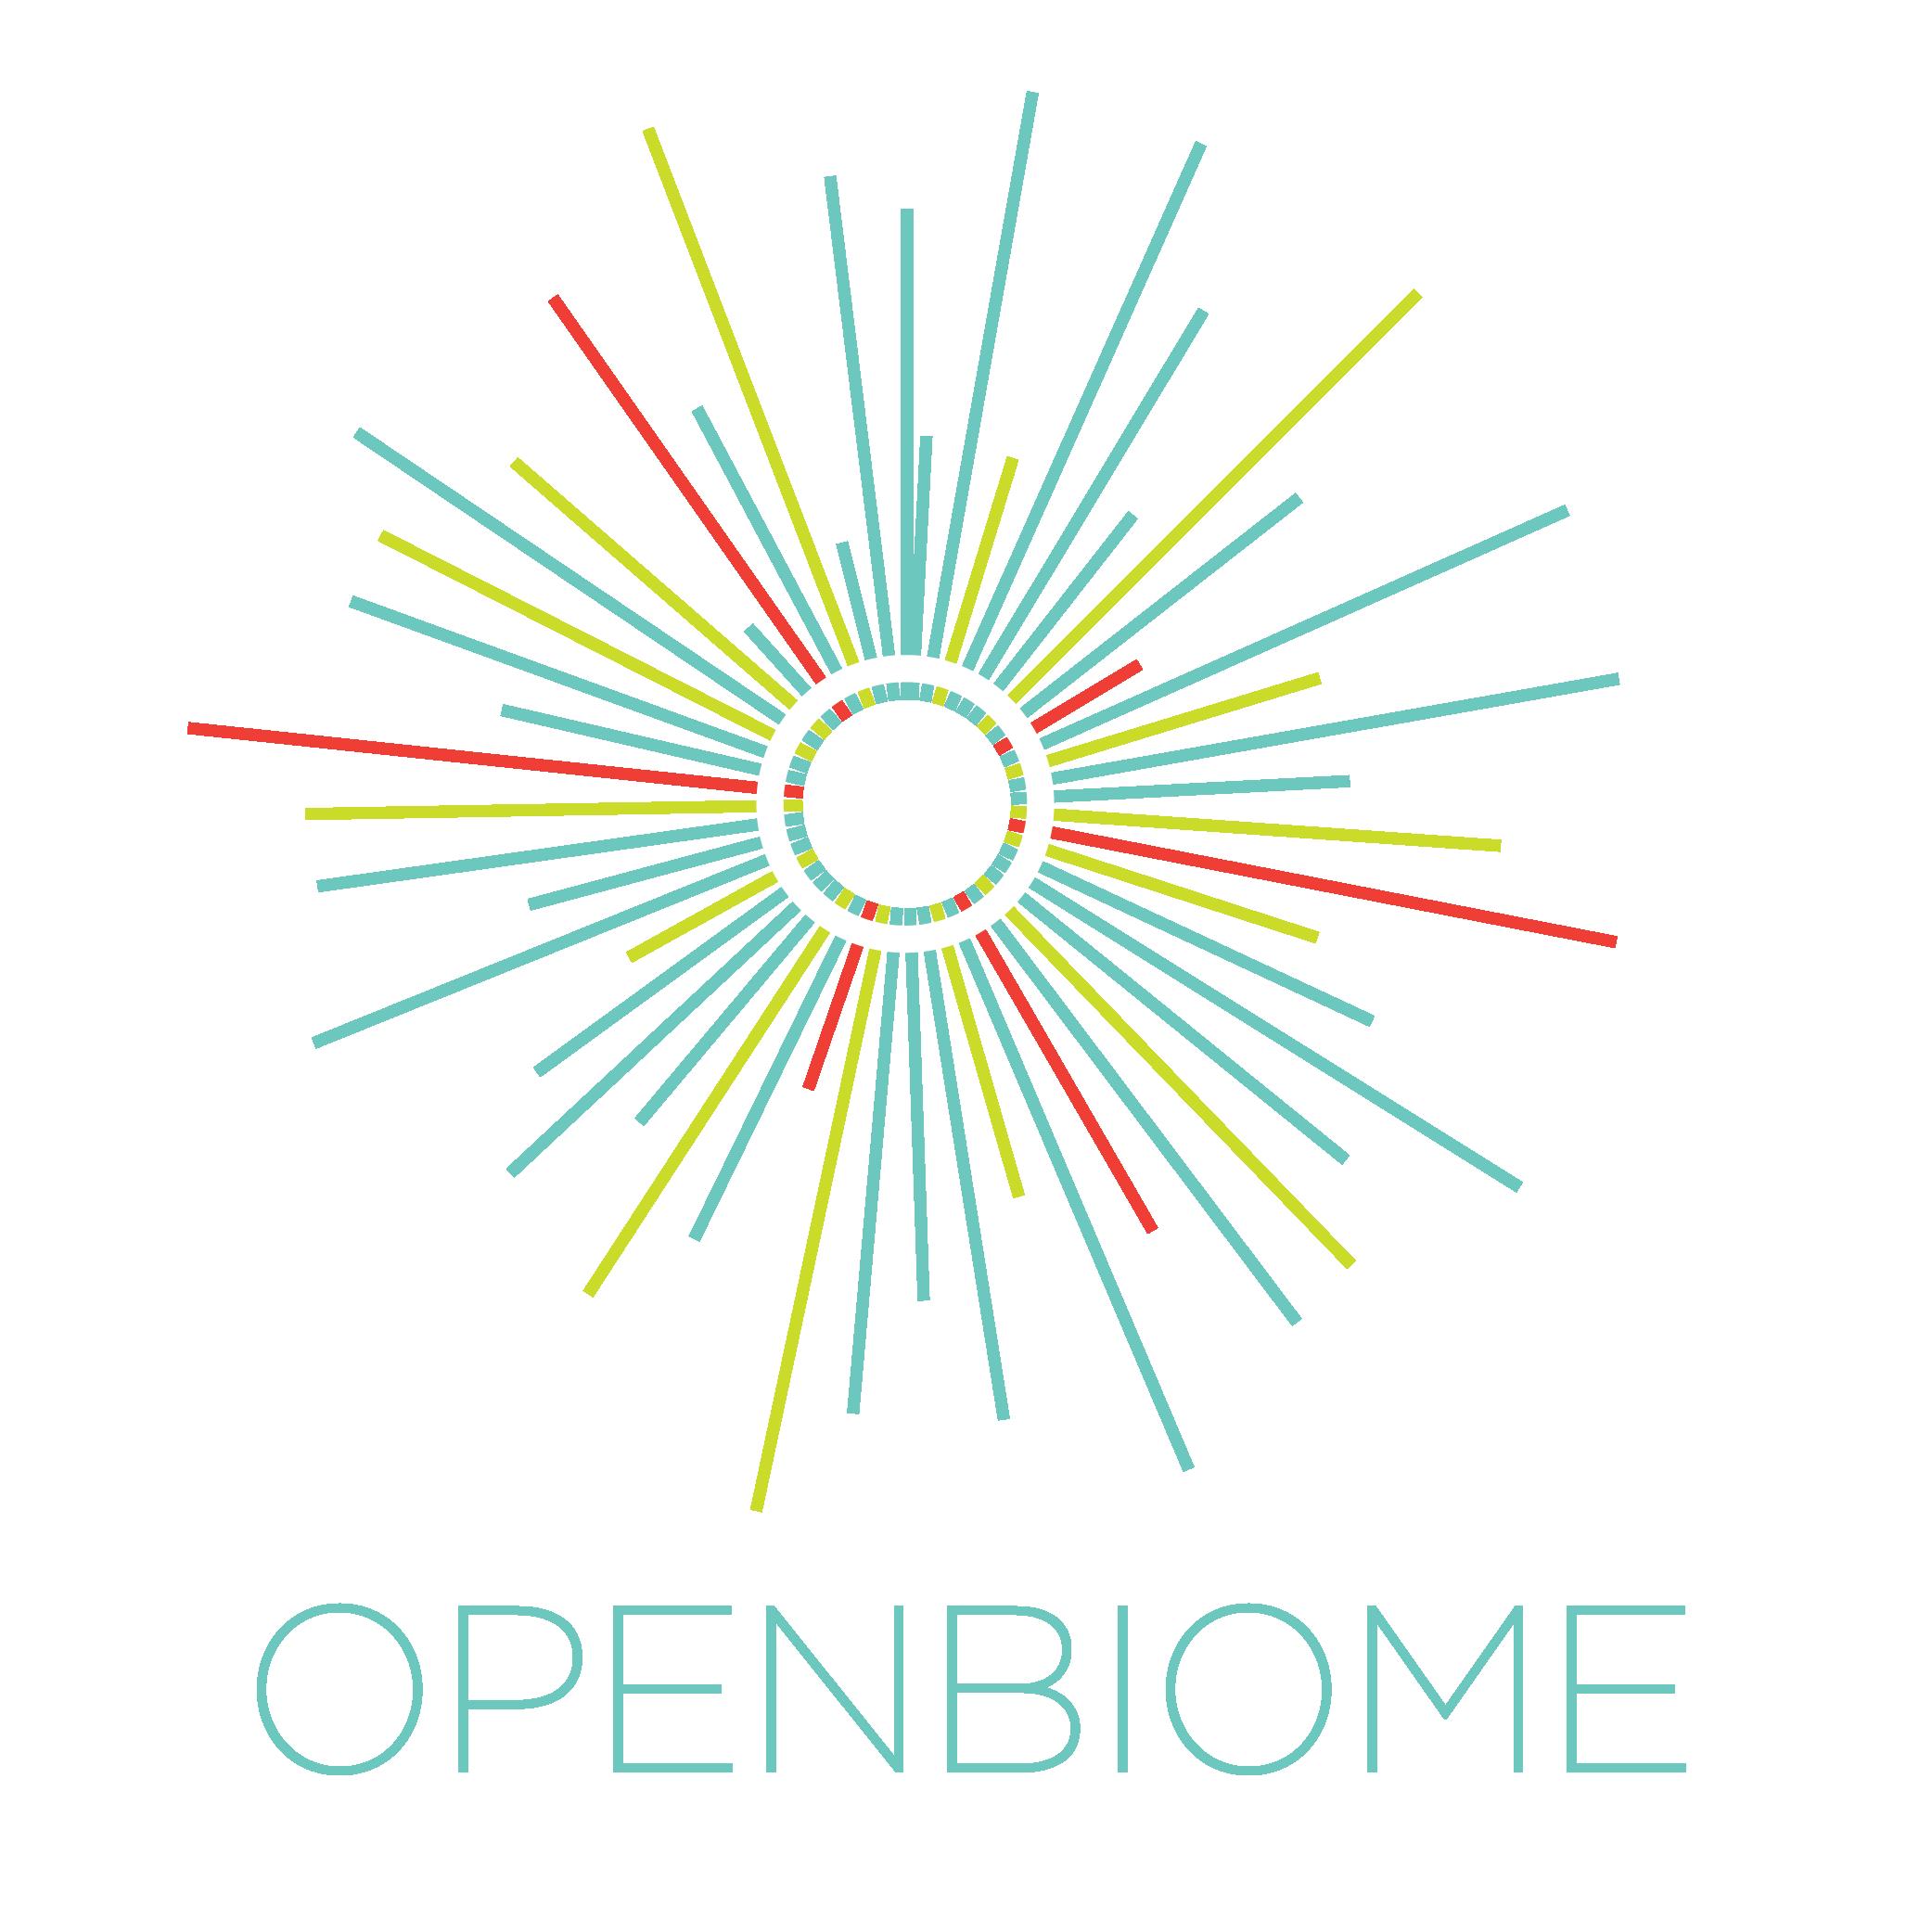 openbiome logo